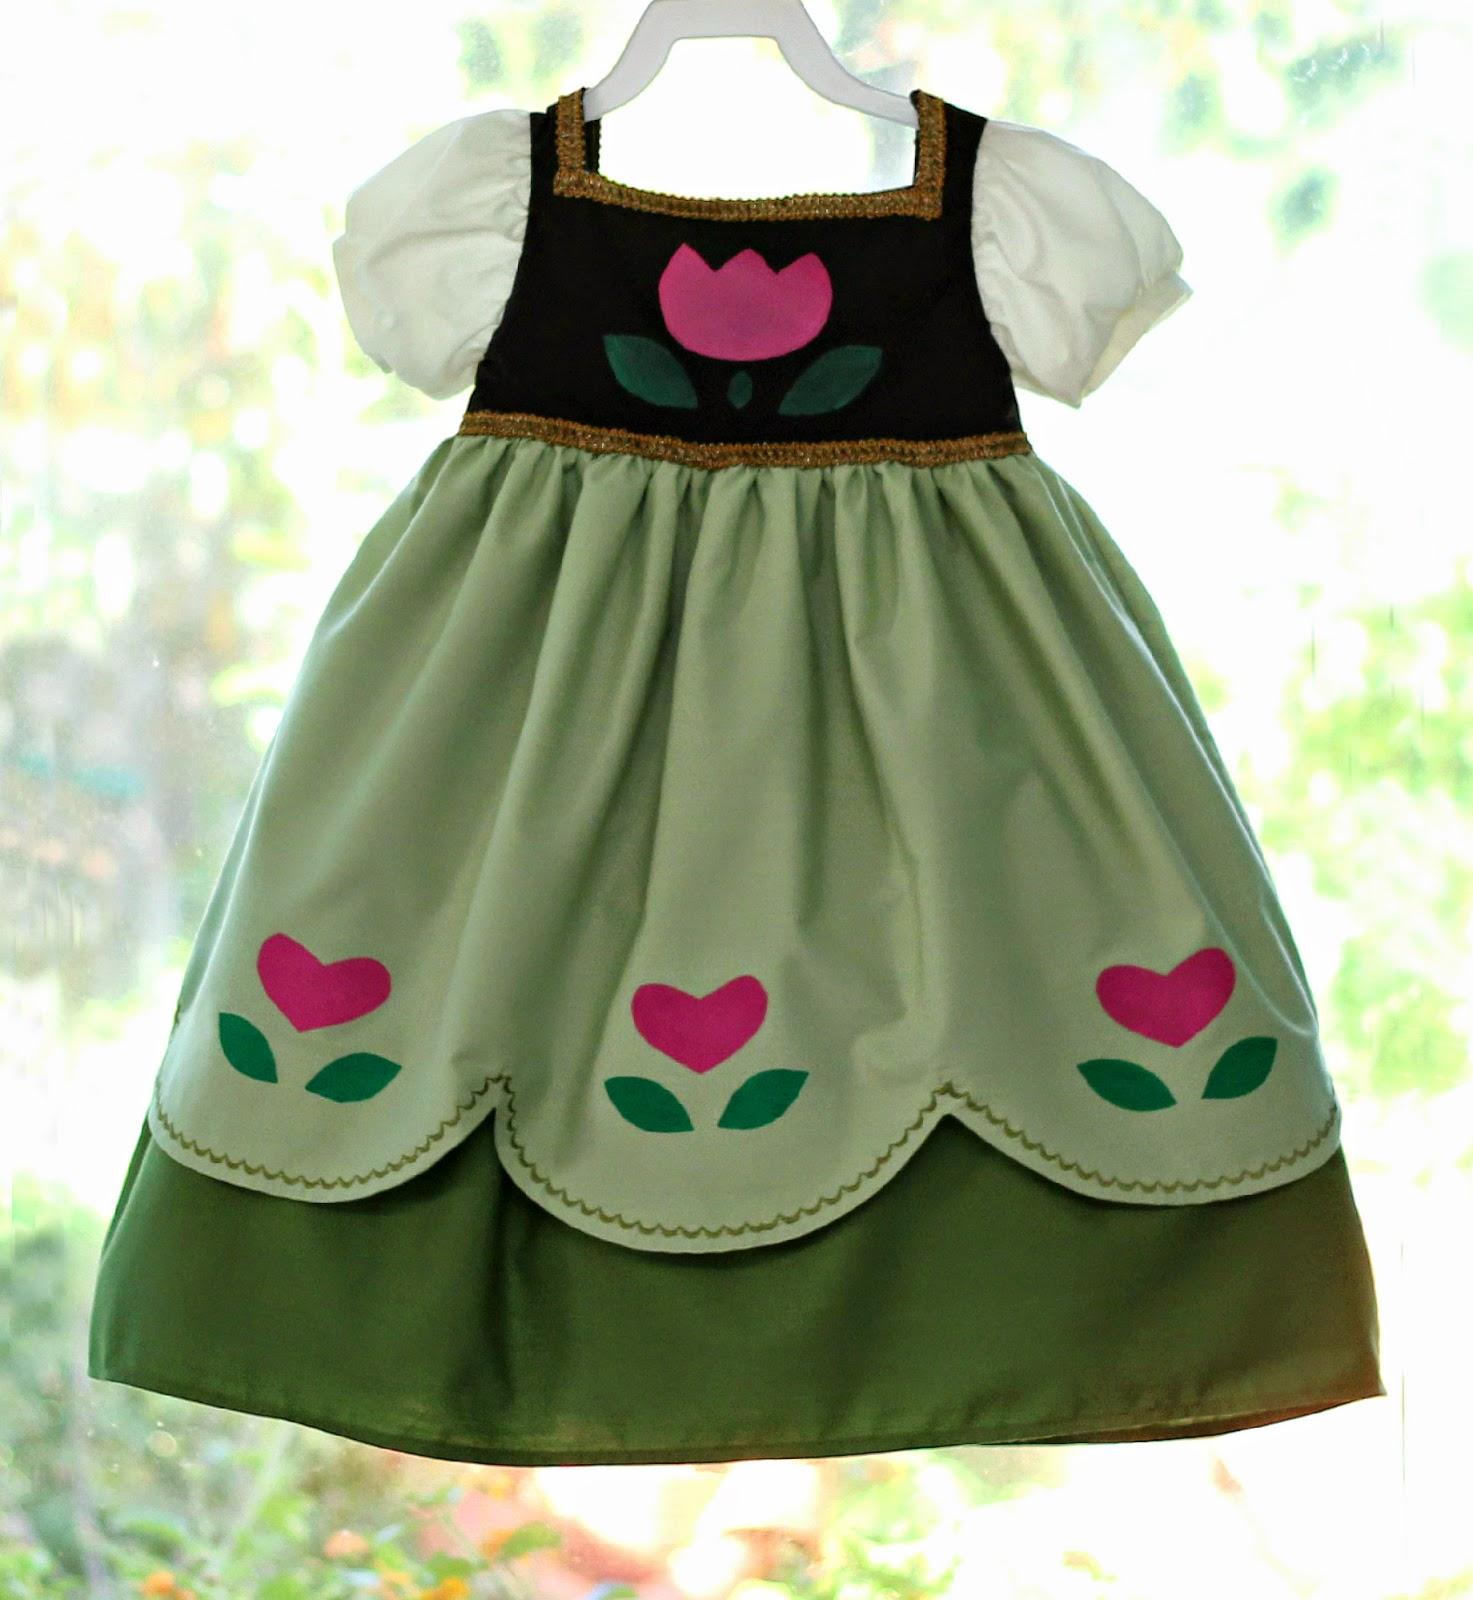 The dress from frozen - Disney Frozen S Little Anna Dress For Little Momo